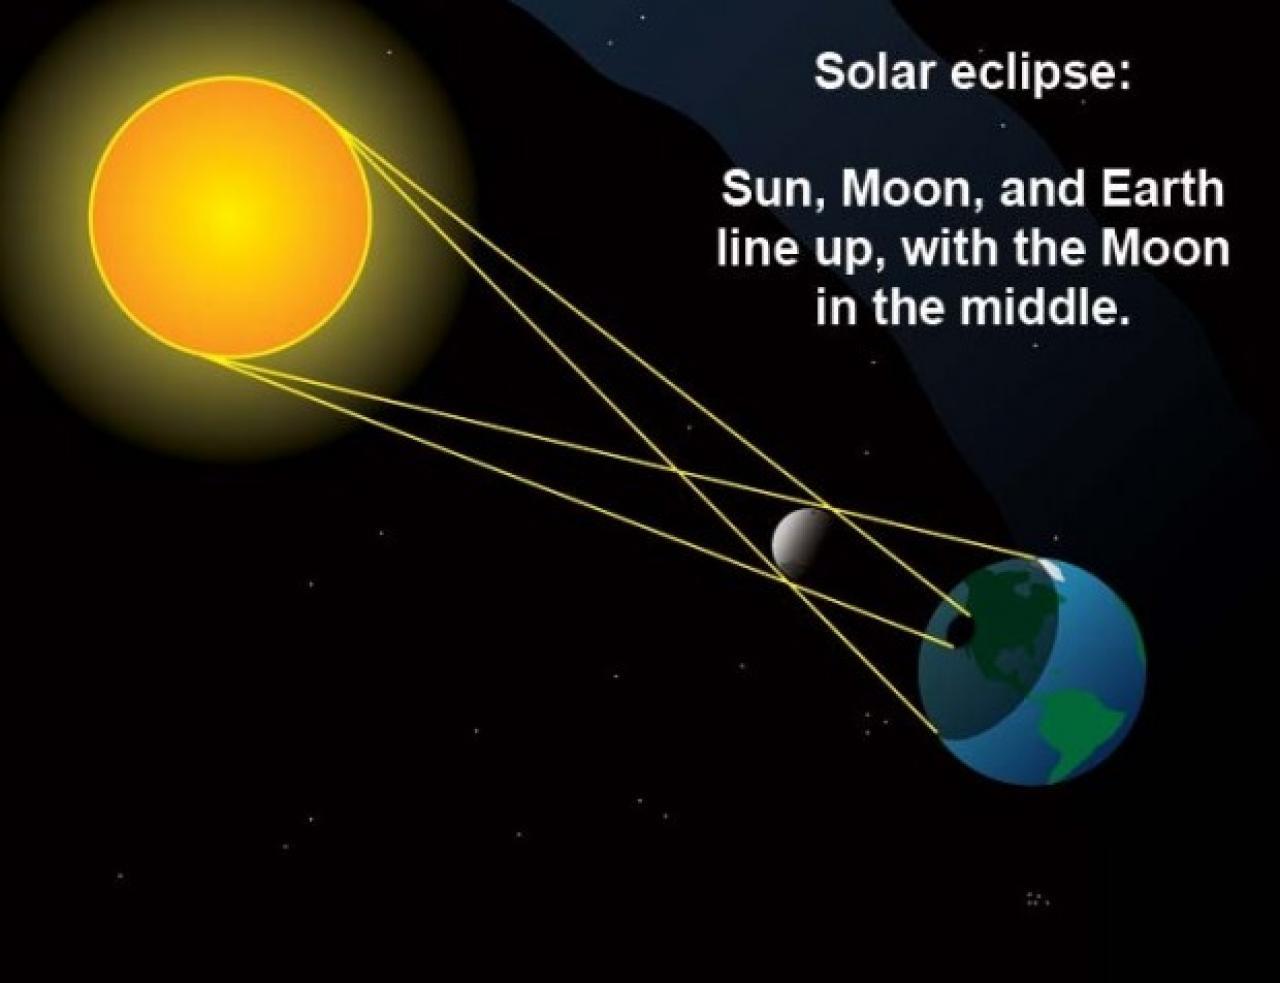 Solar For America >> diagrama-eclipse-solar-620x476.jpg | tecno.americaeconomia.com | AETecno - AméricaEconomía